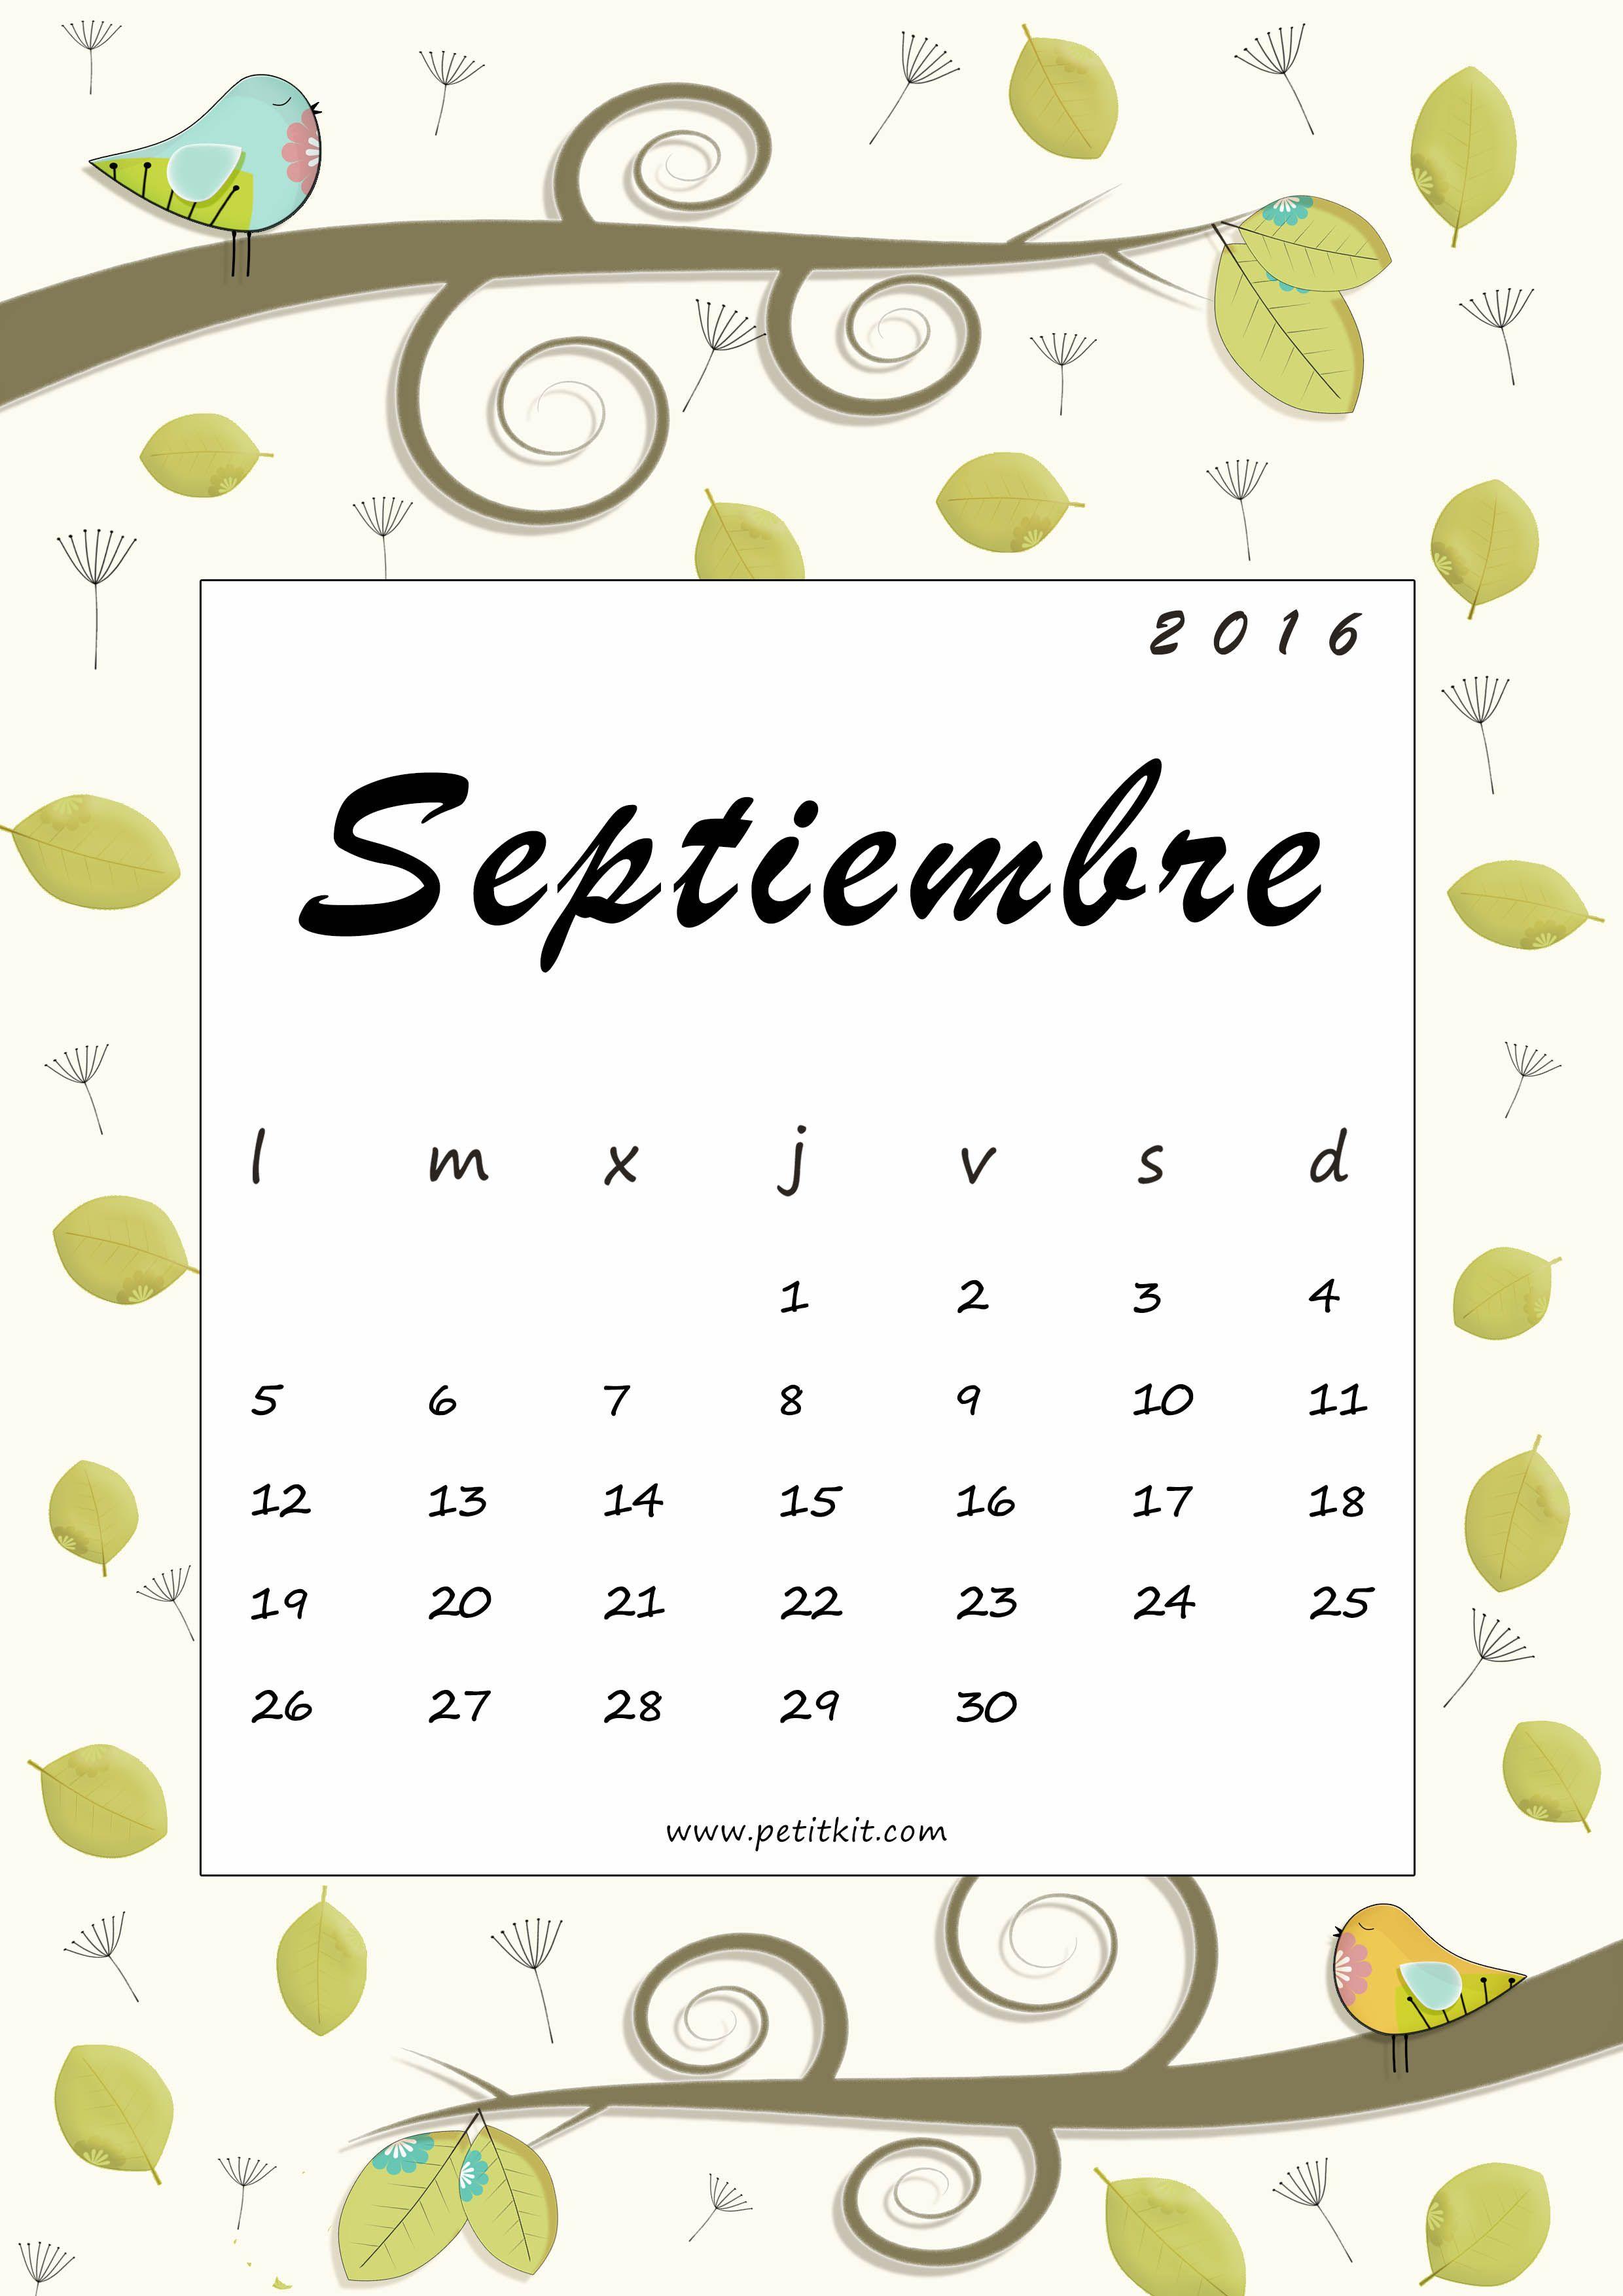 Calendario De Septiembre 2019 Para Imprimir Animado.Calendario 2019 En Formato Pdf Para Imprimir Calendario